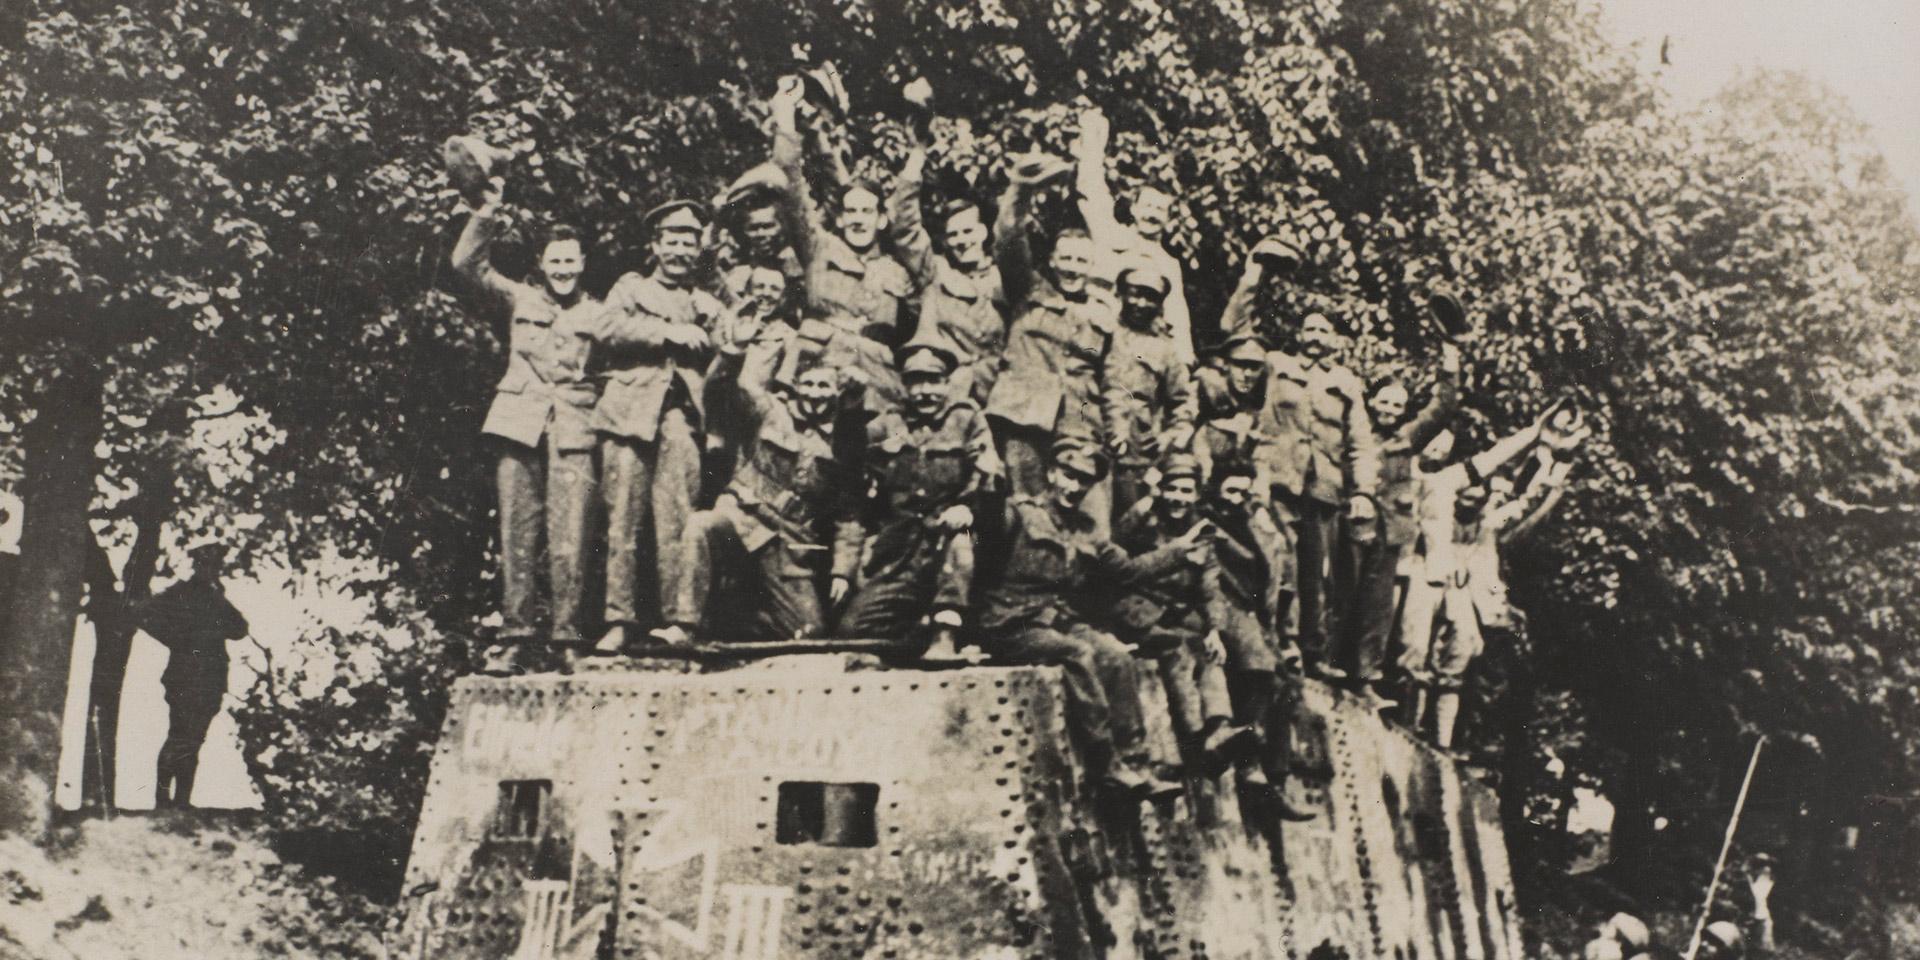 The tank clash at Villers-Bretonneux